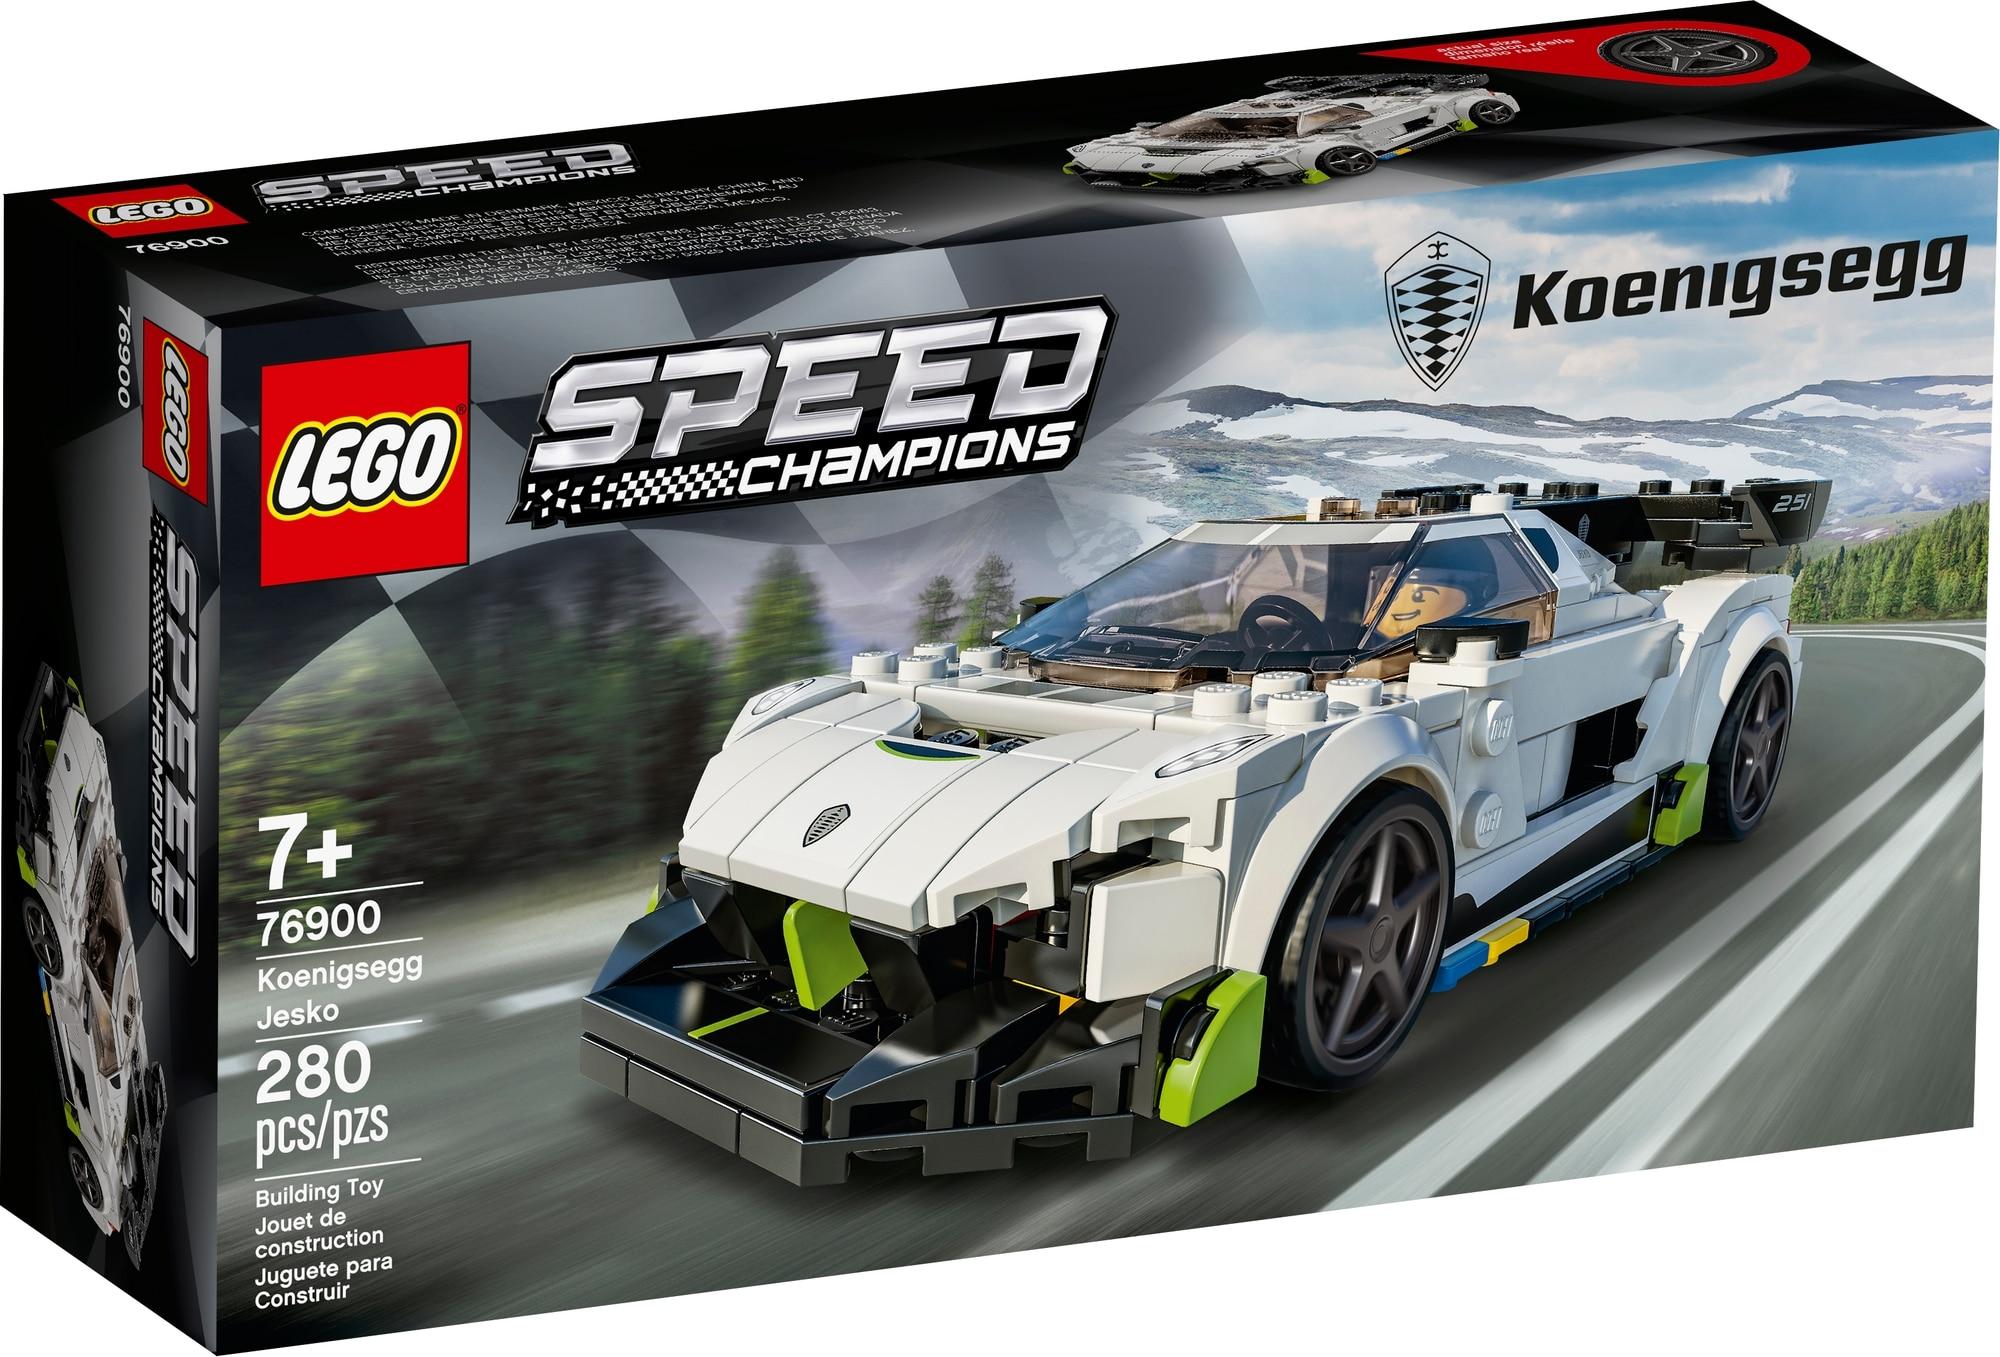 LEGO Speed Champions 76900 Koenigsegg Jesko 2